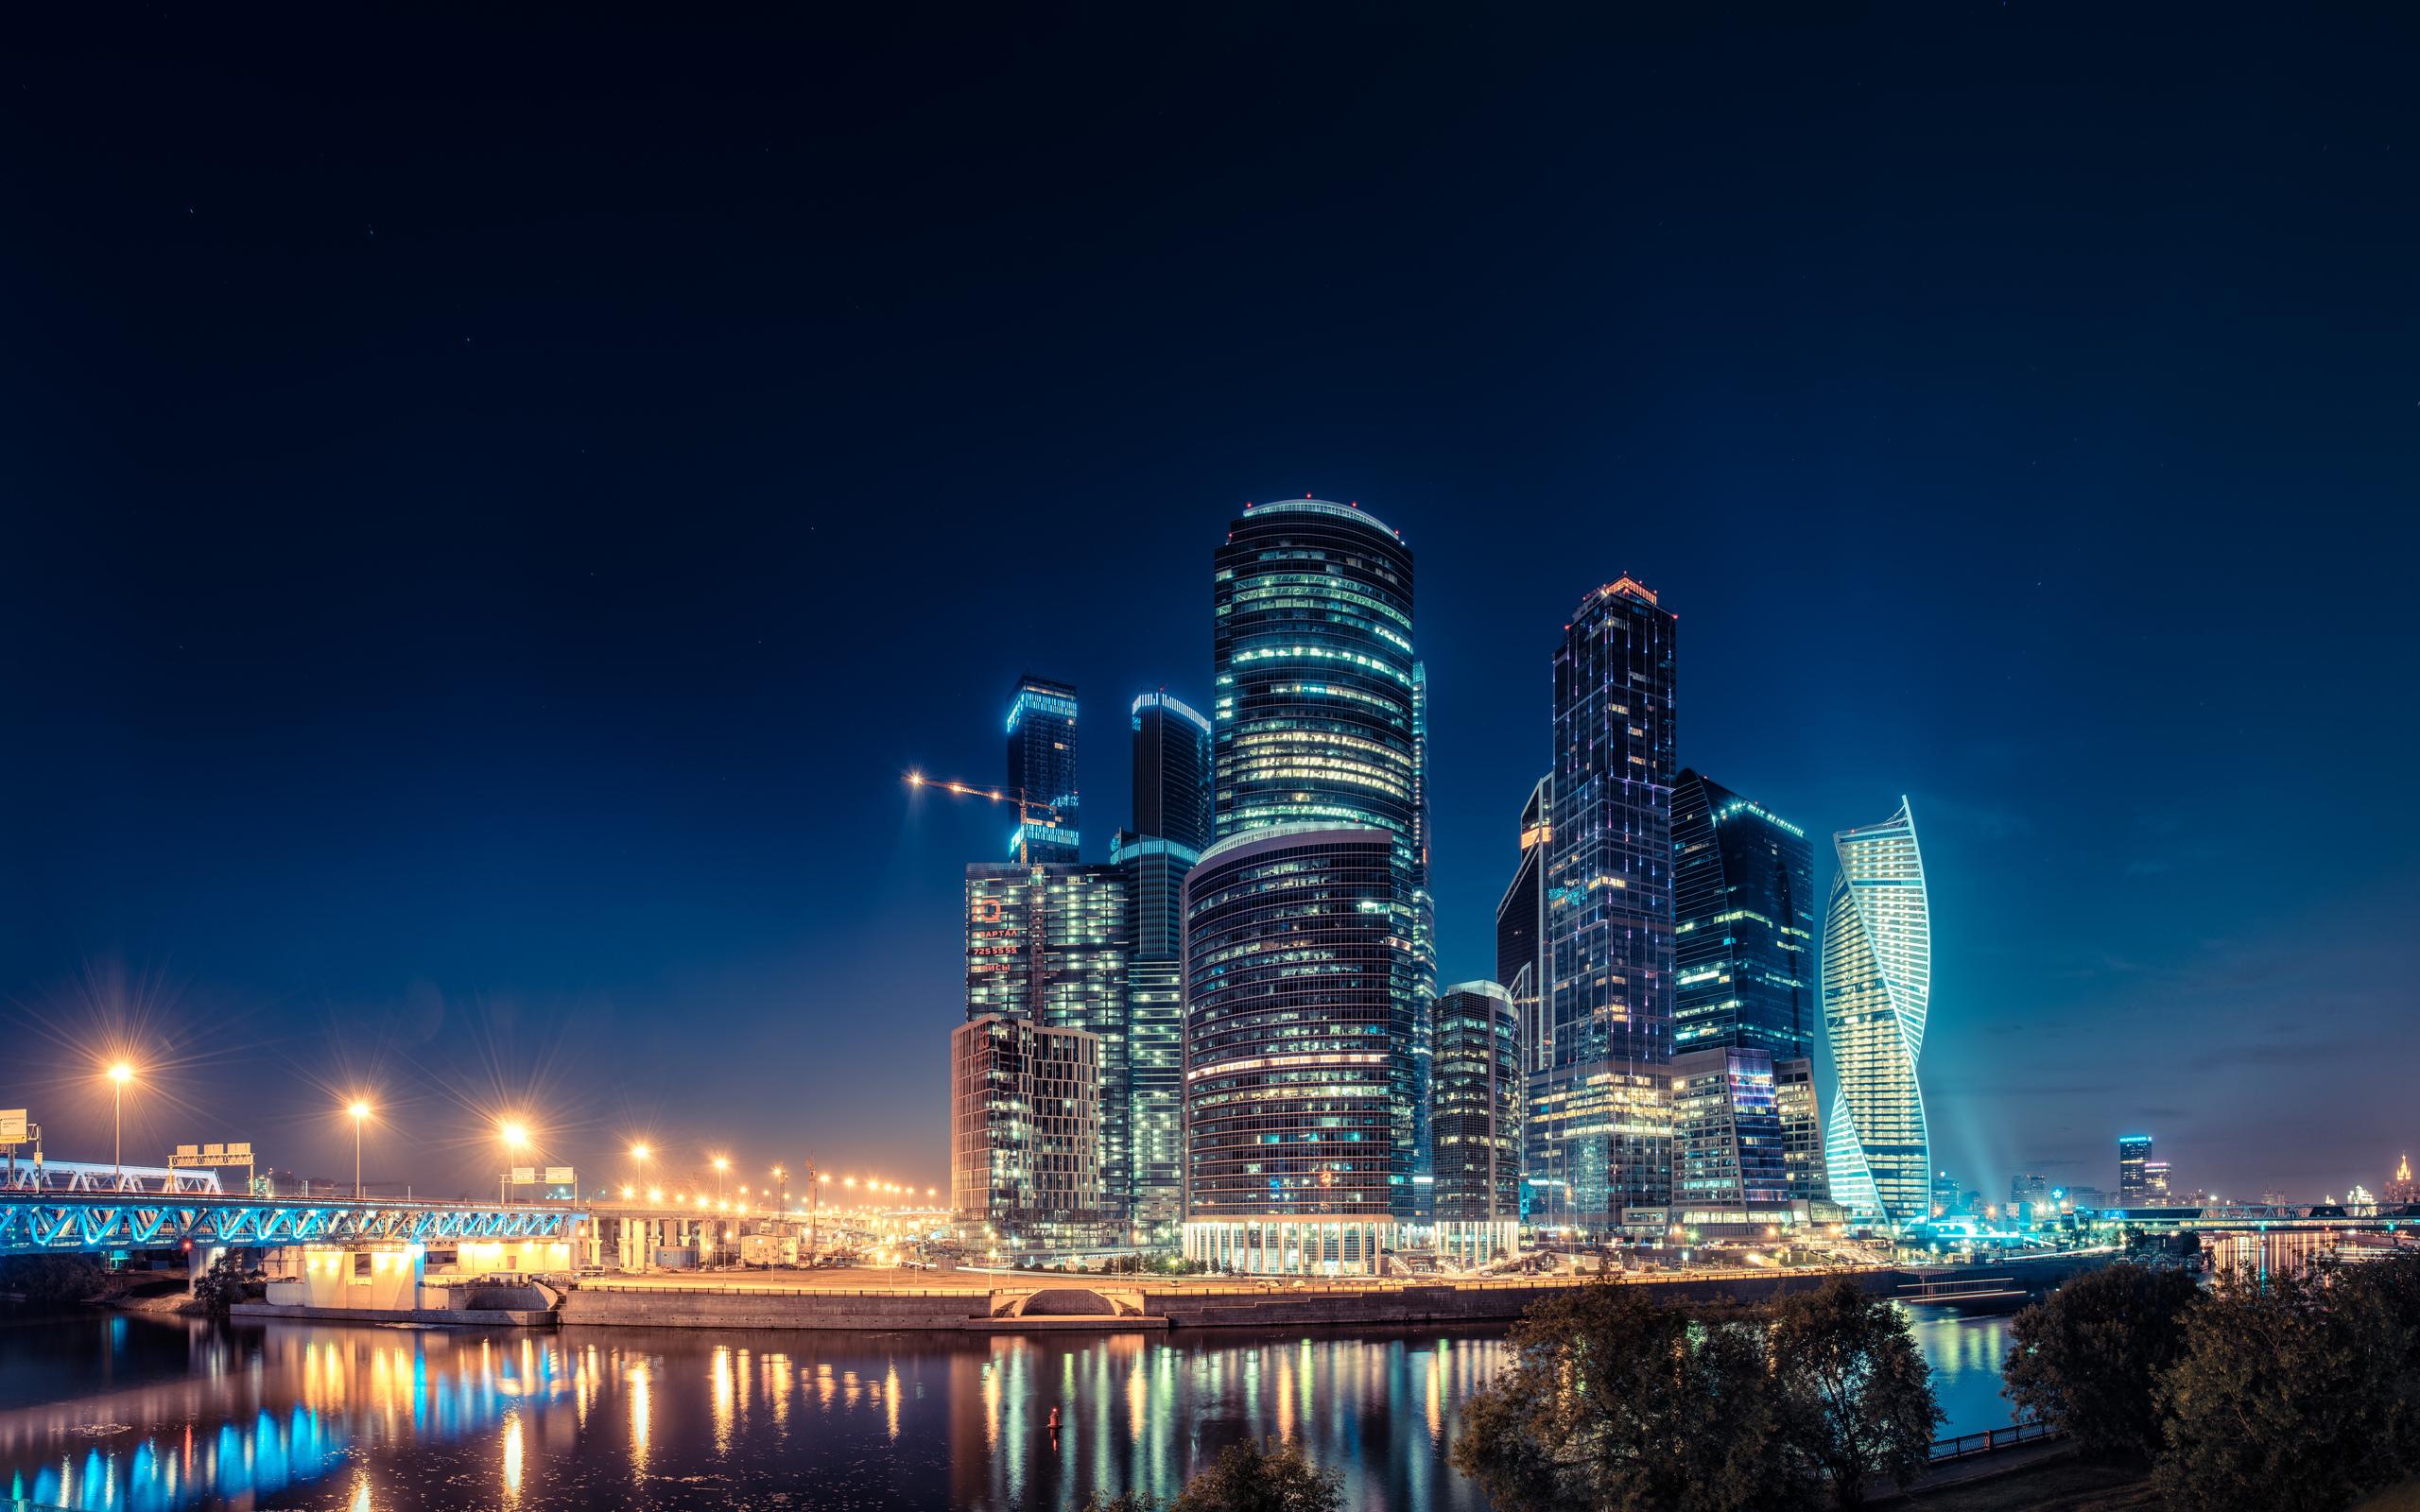 страны город архитектура ночь Москва сити Россия  № 2582831 бесплатно